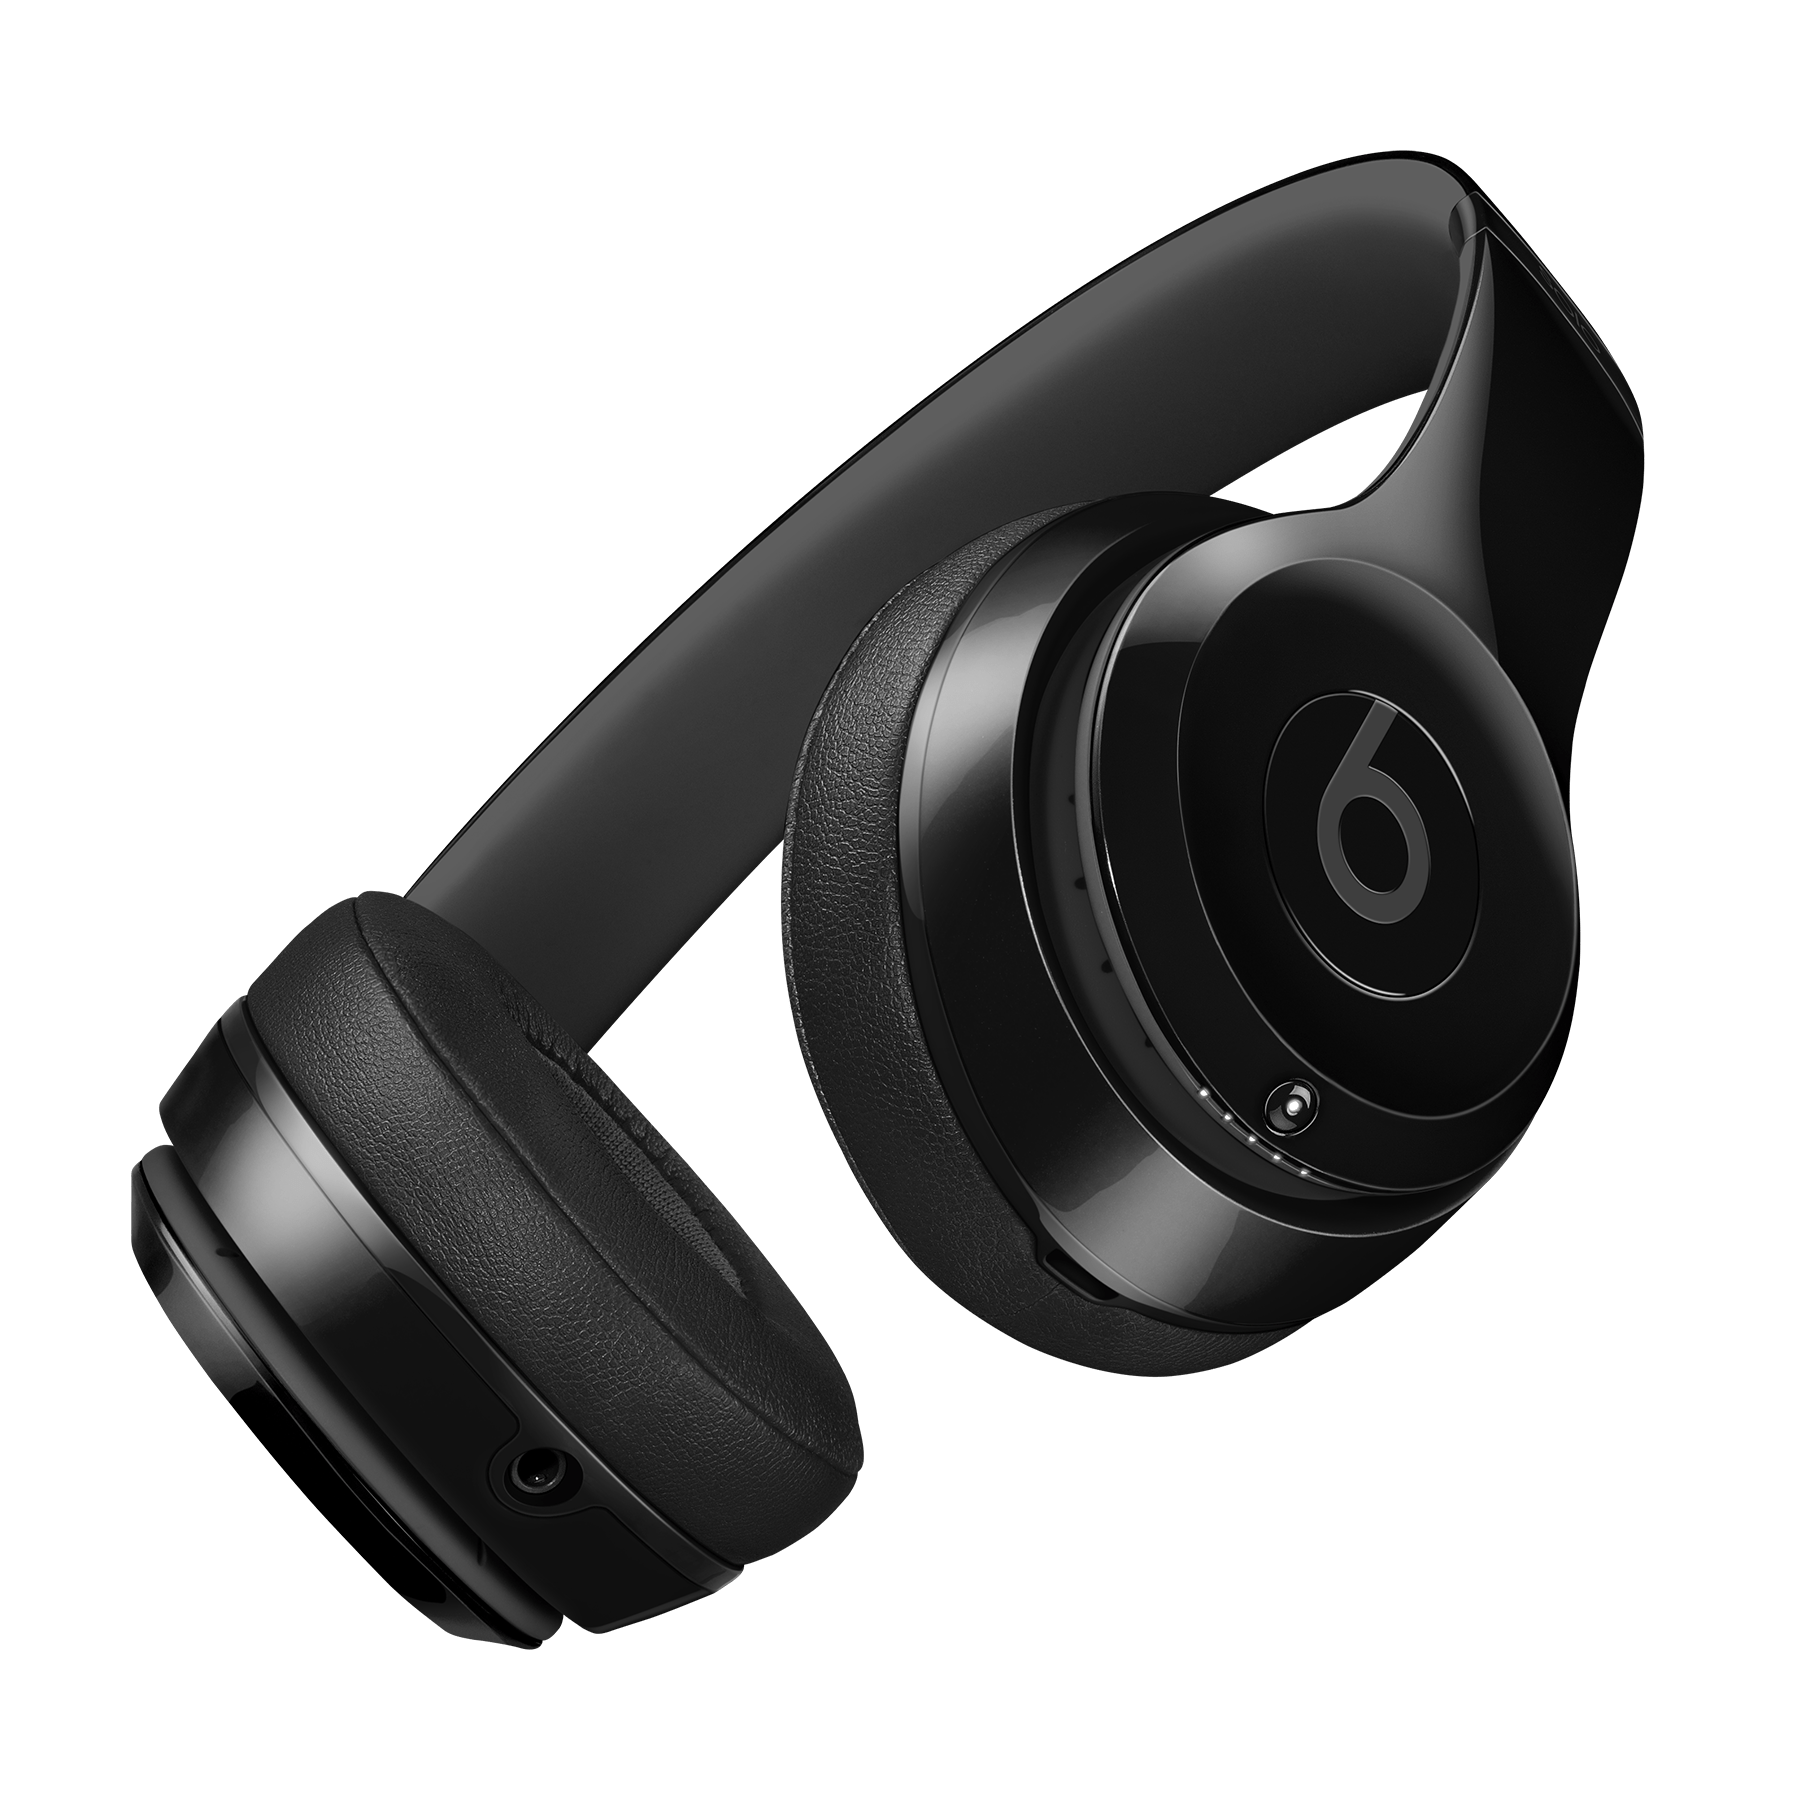 e2ed69c6a5129 Beats Solo3 Wireless - Beats by Dre (AU)